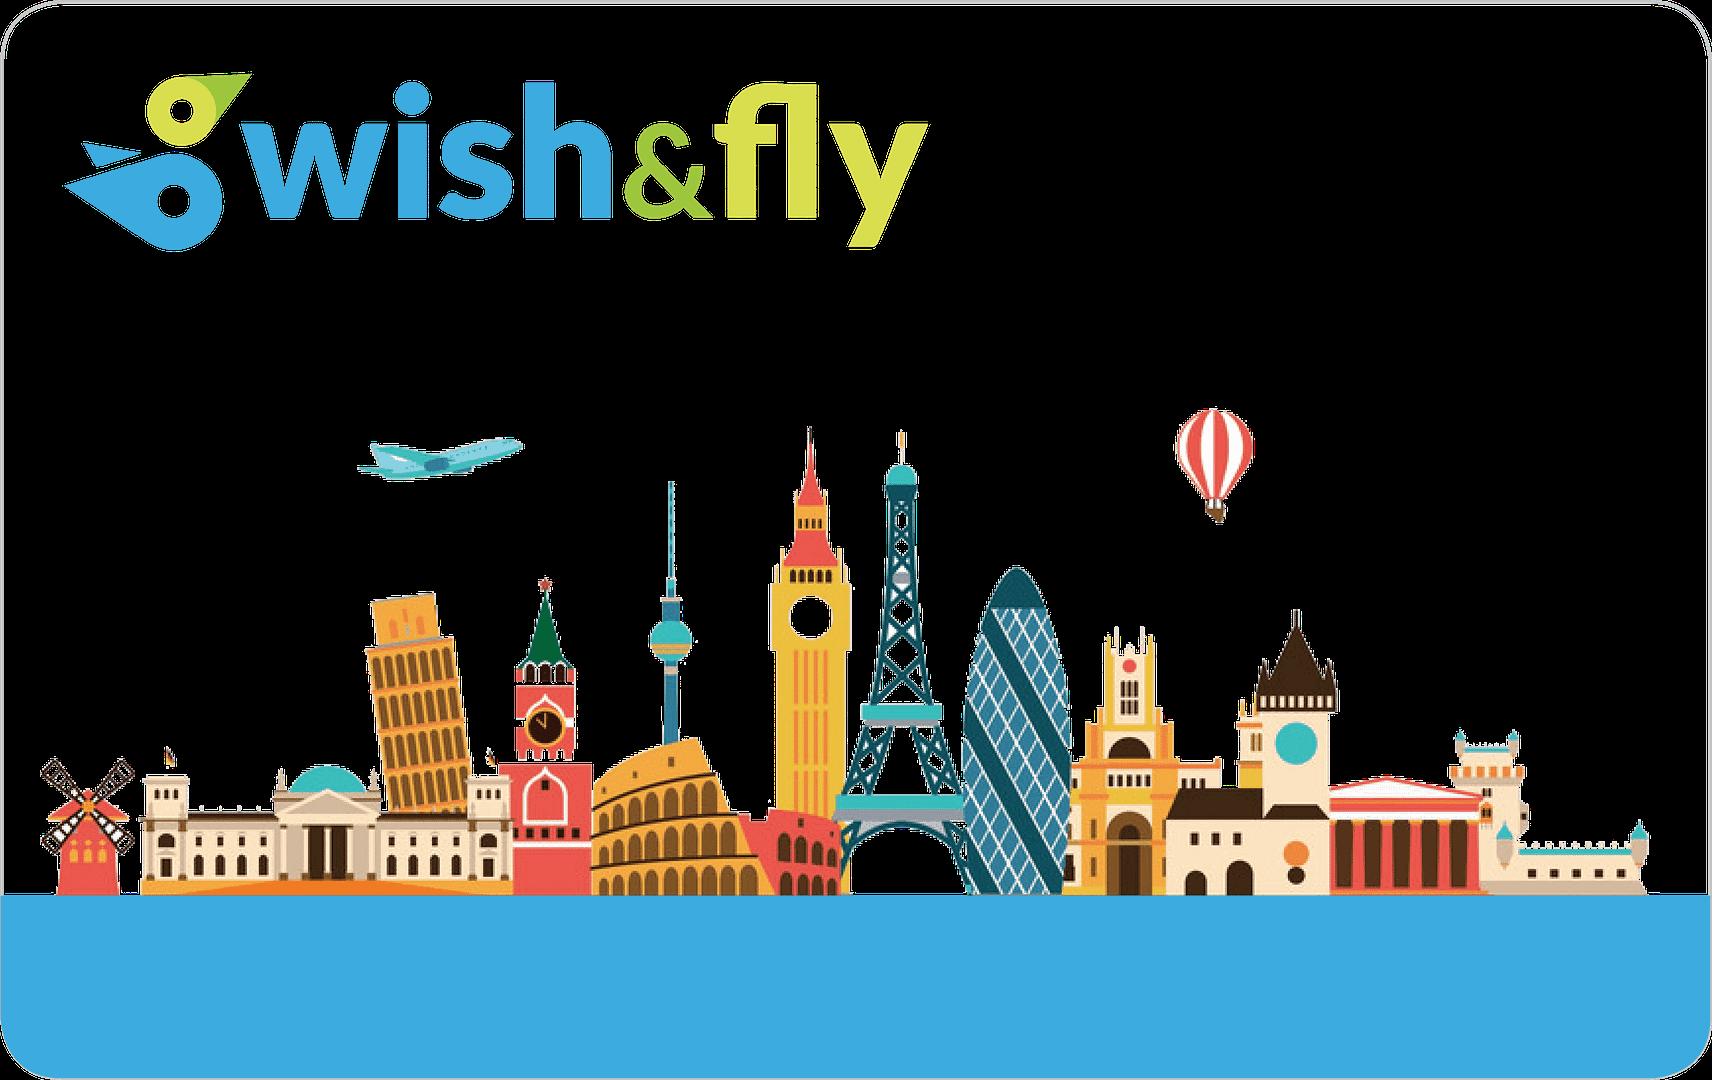 tarjeta regalo wishandfly viaje sorpresa